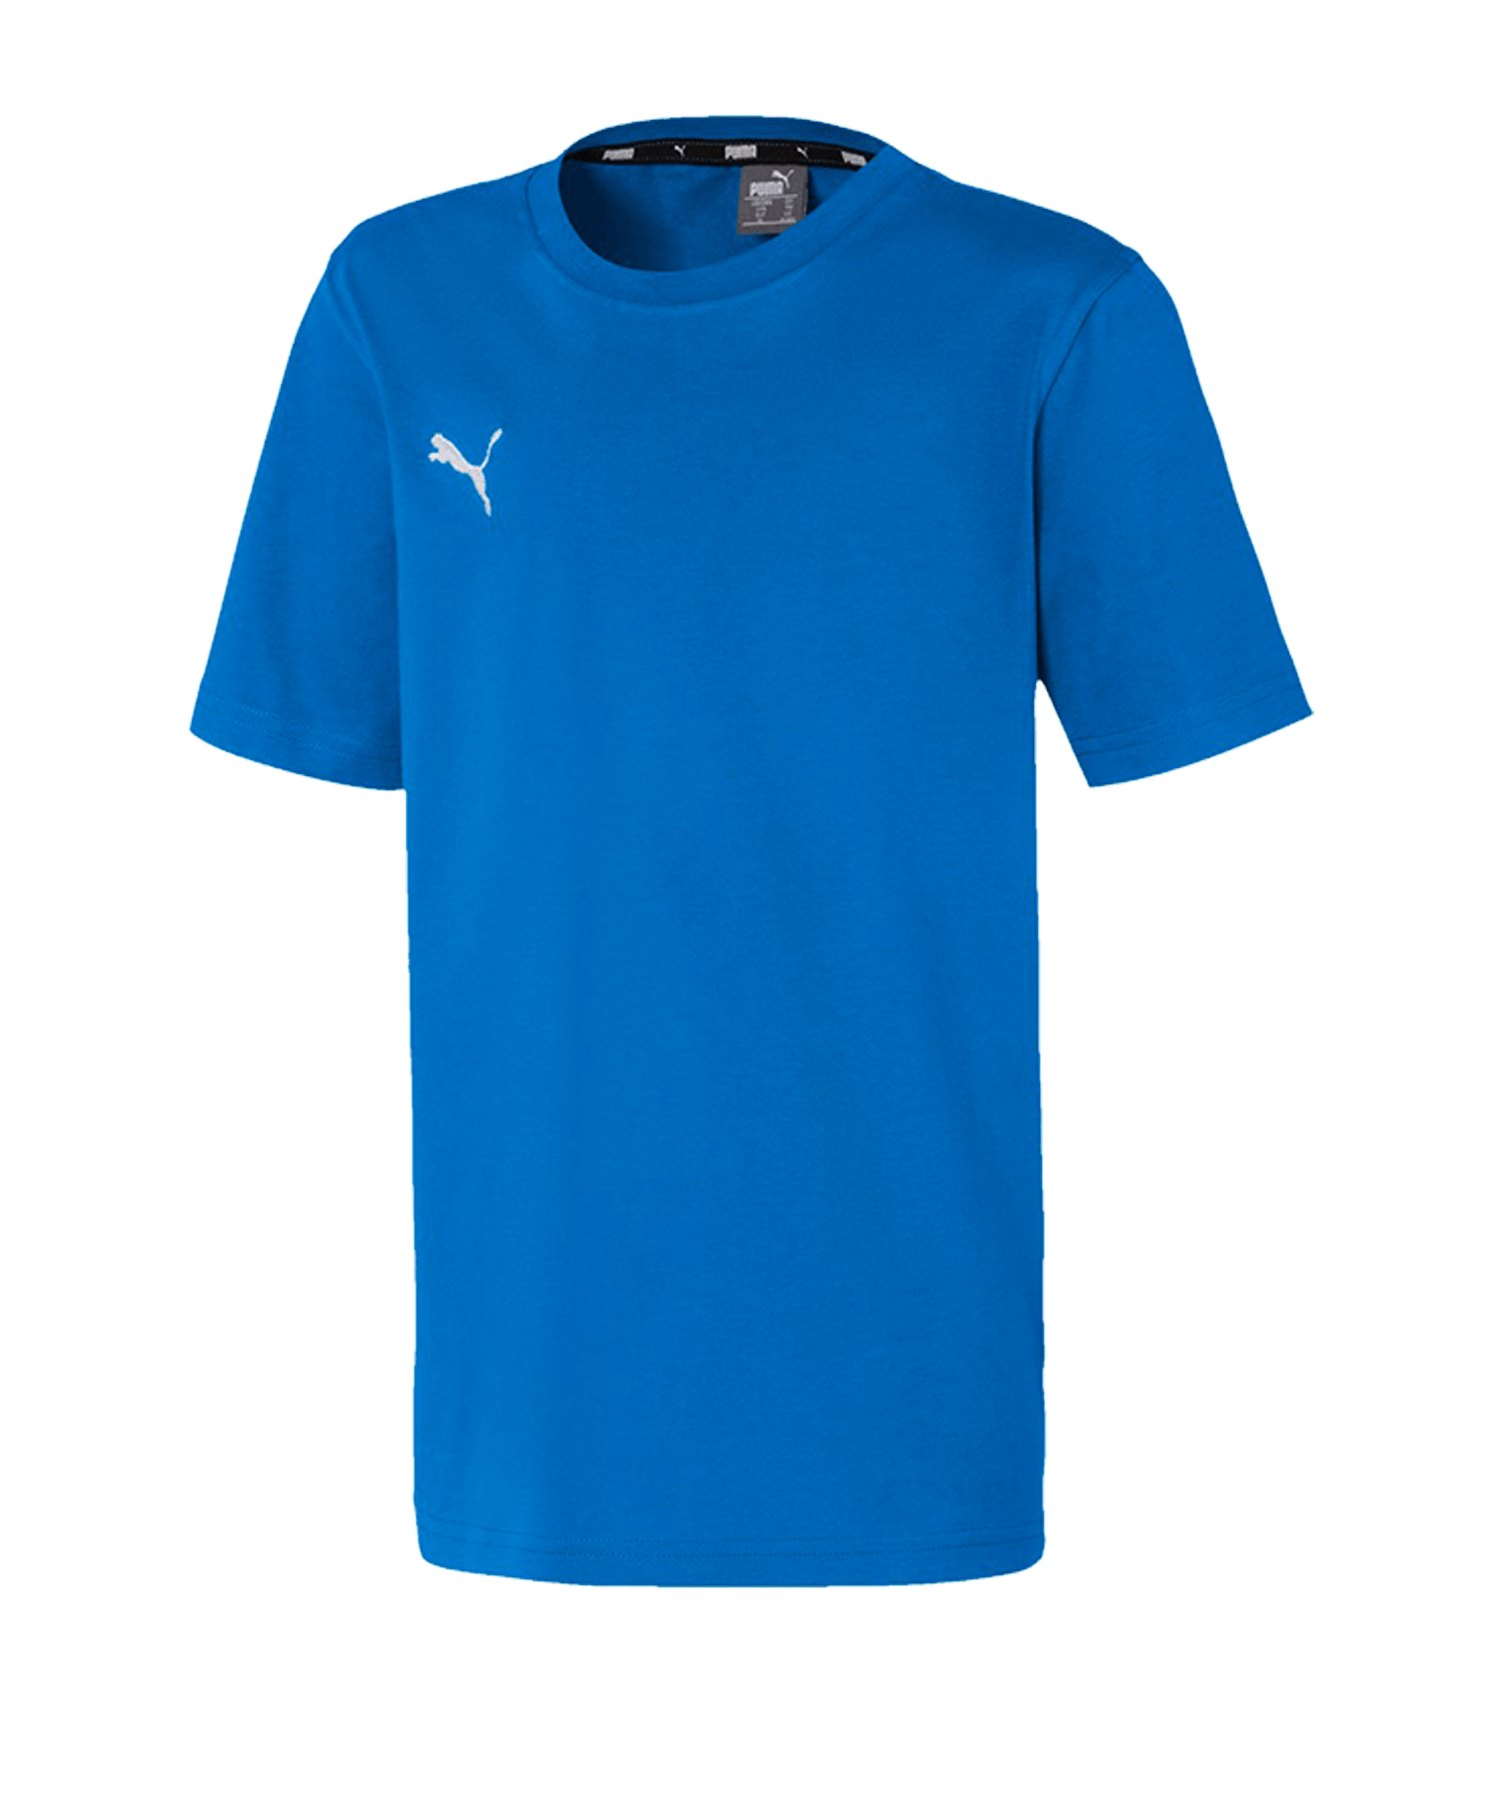 PUMA teamGOAL 23 Casuals Tee T-Shirt Kids Blau F02 - blau